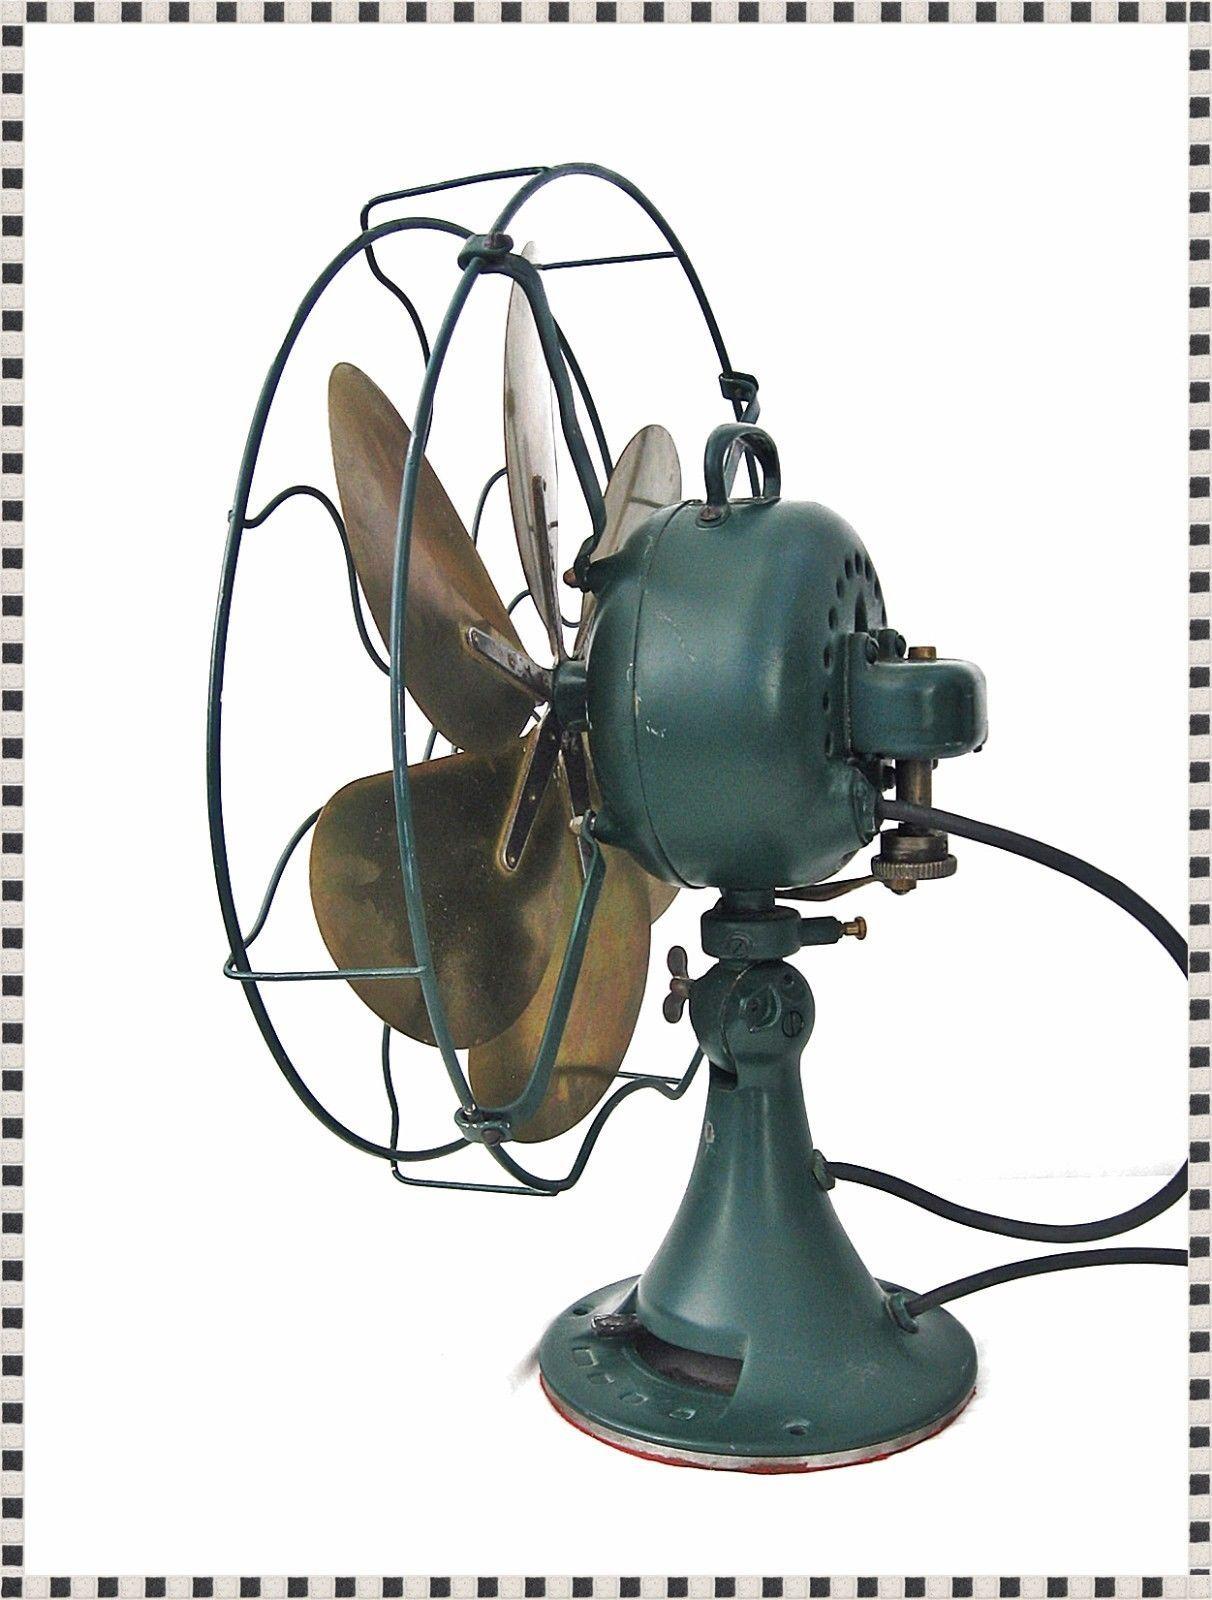 Vintage 1920 S 16 Emerson Electric Oscillating 3 Speed 6 Brass Parker Blade Fan Antique Fans Emerson Electric Fan Blade Art